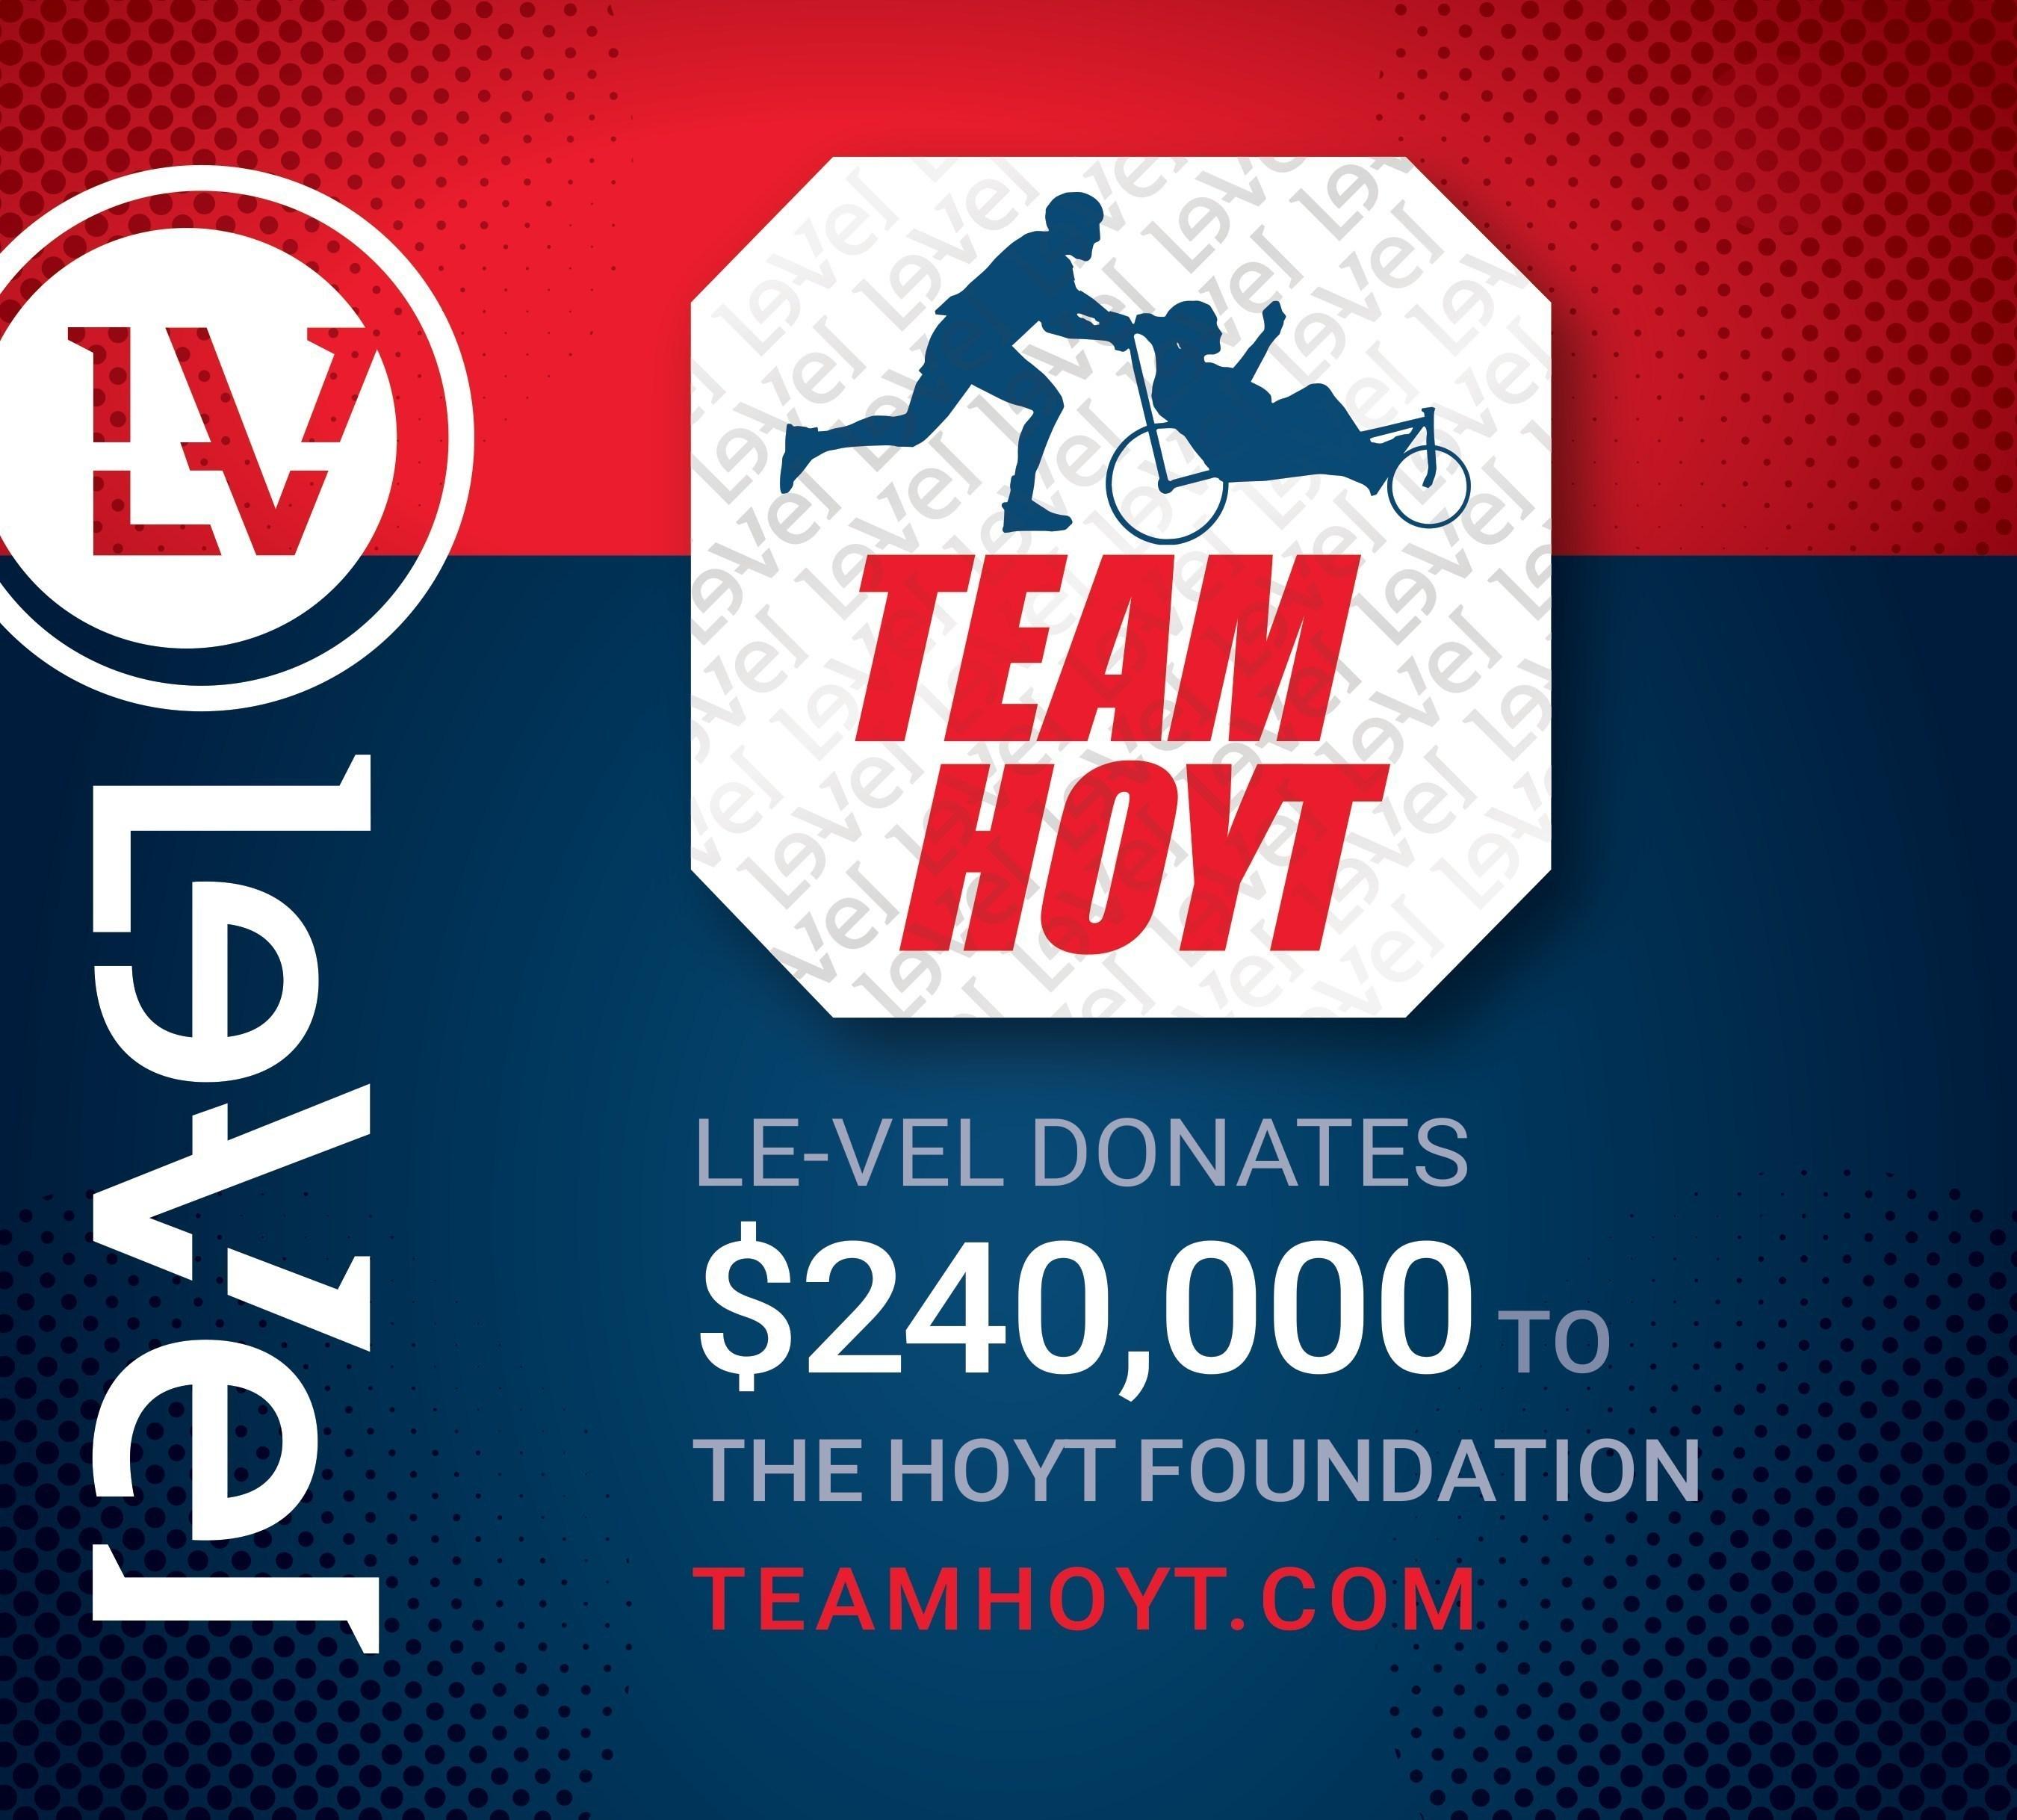 Le-Vel donates $240,000 to Hoyt Foundation/teamhoyt.com